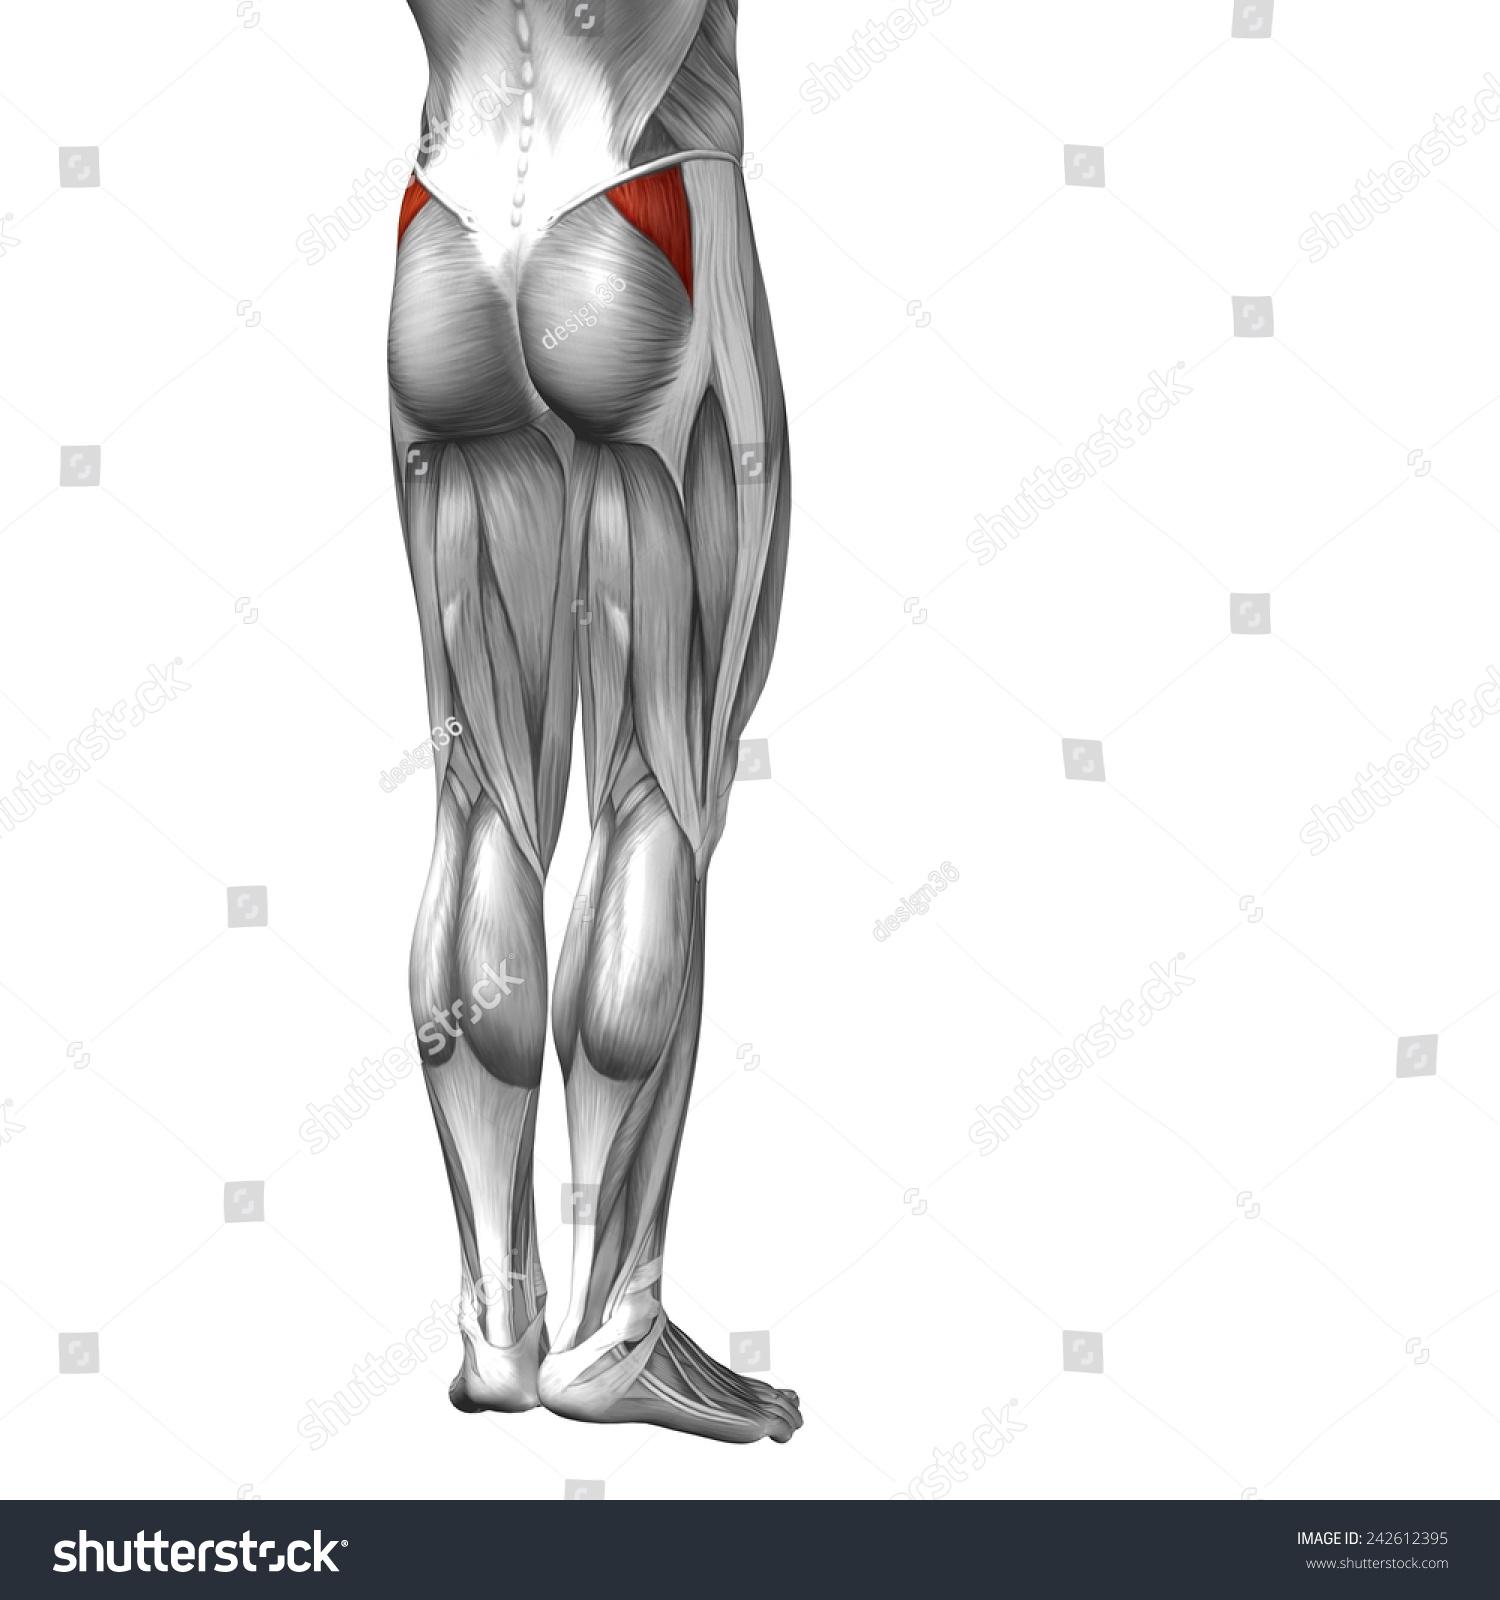 Conceptual 3 D Gluteus Medius Human Anatomy Stock Illustration ...